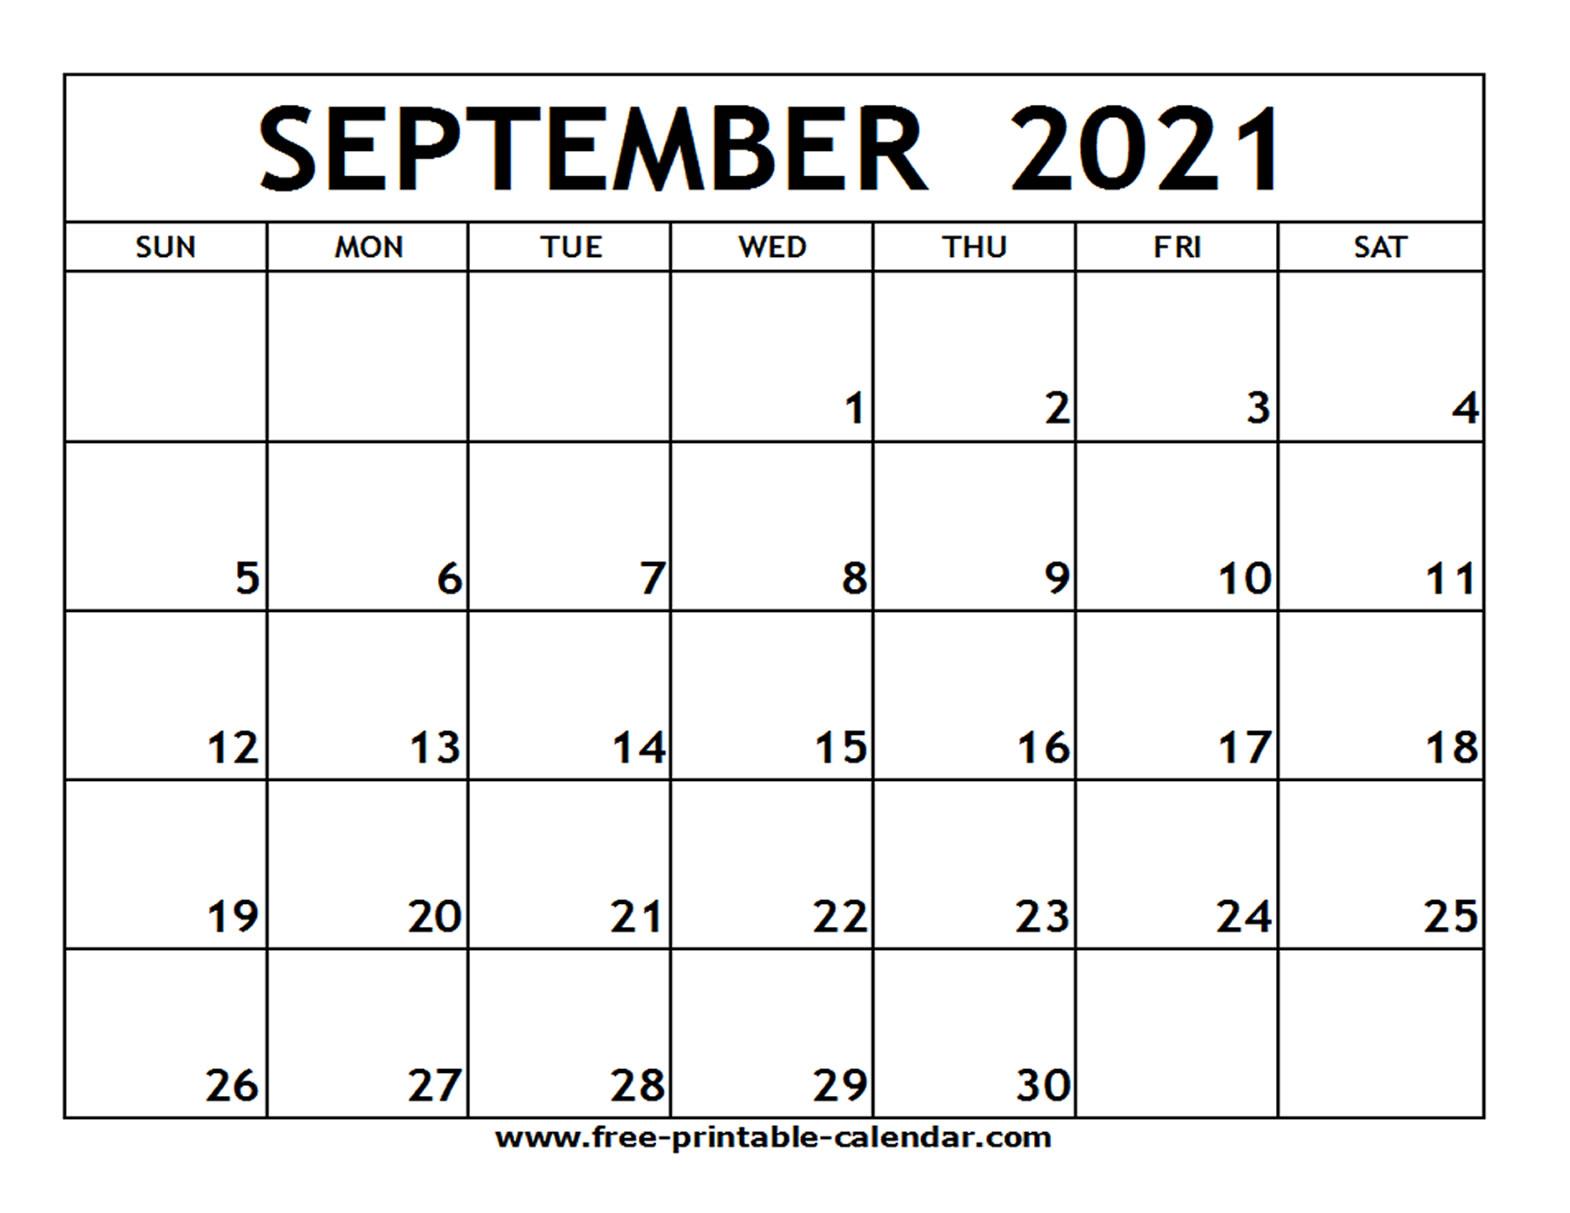 September 2021 Printable Calendar  Freeprintablecalendar for September Blank Calendar